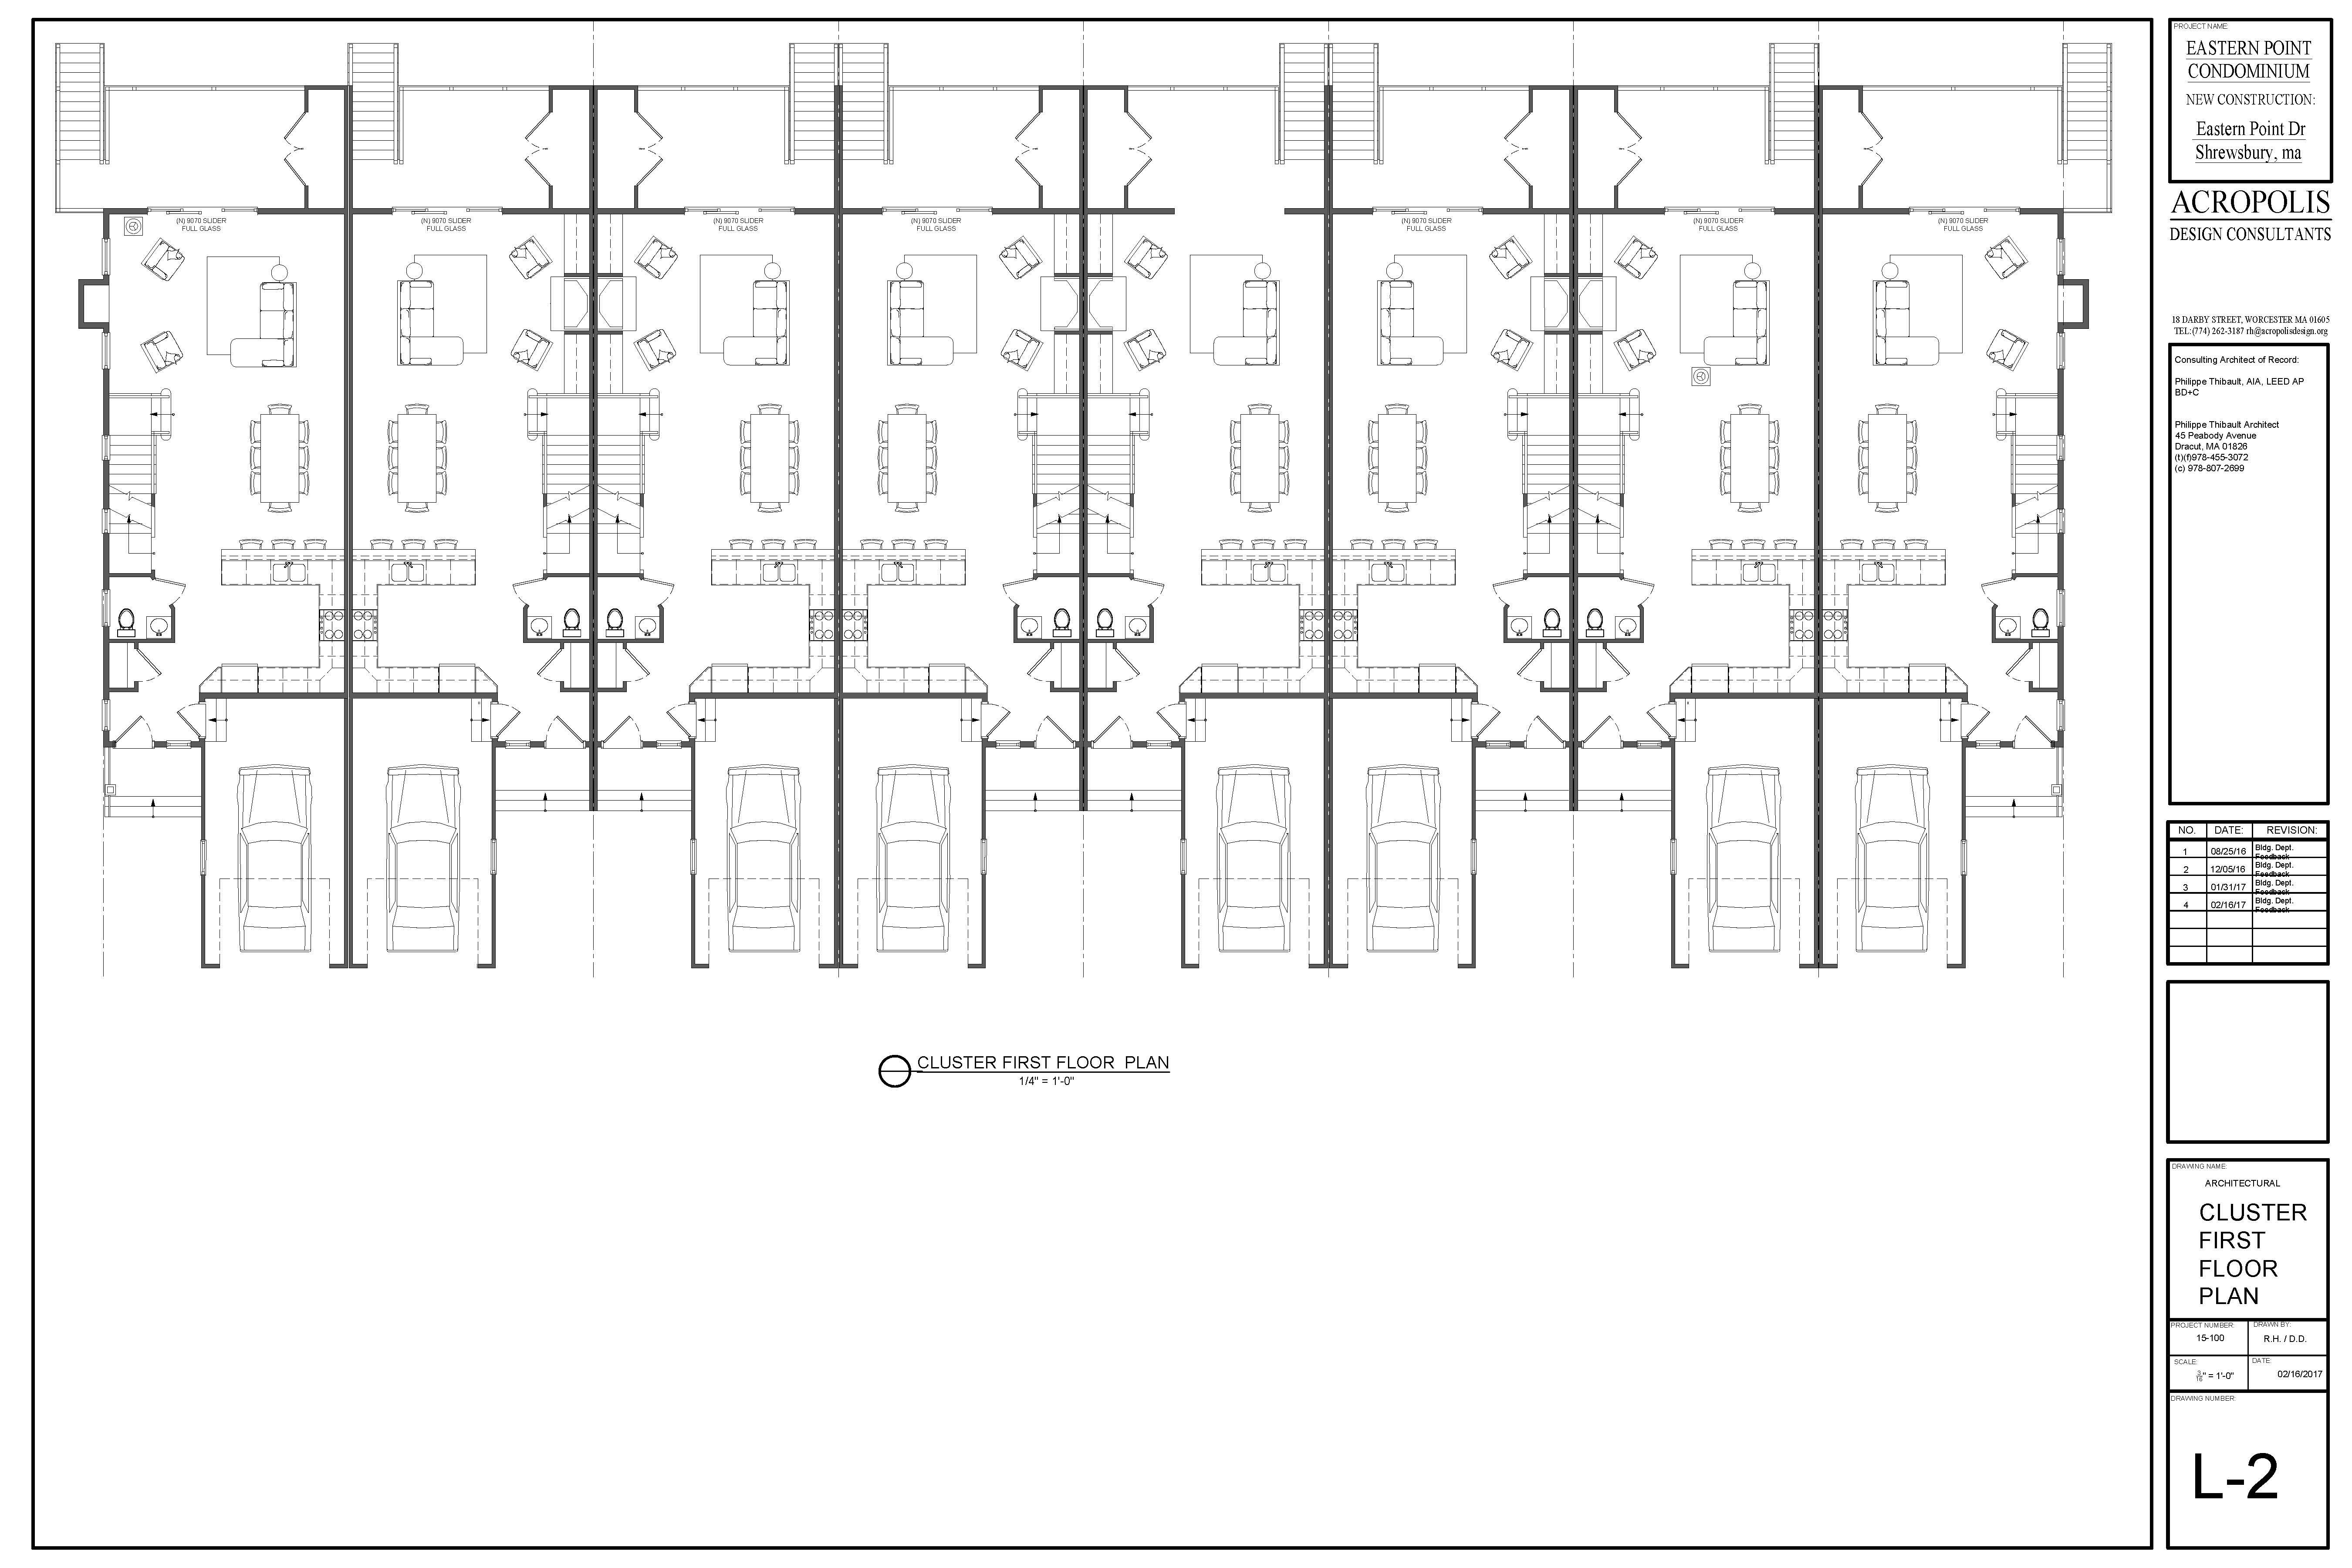 Cluster First floor plan